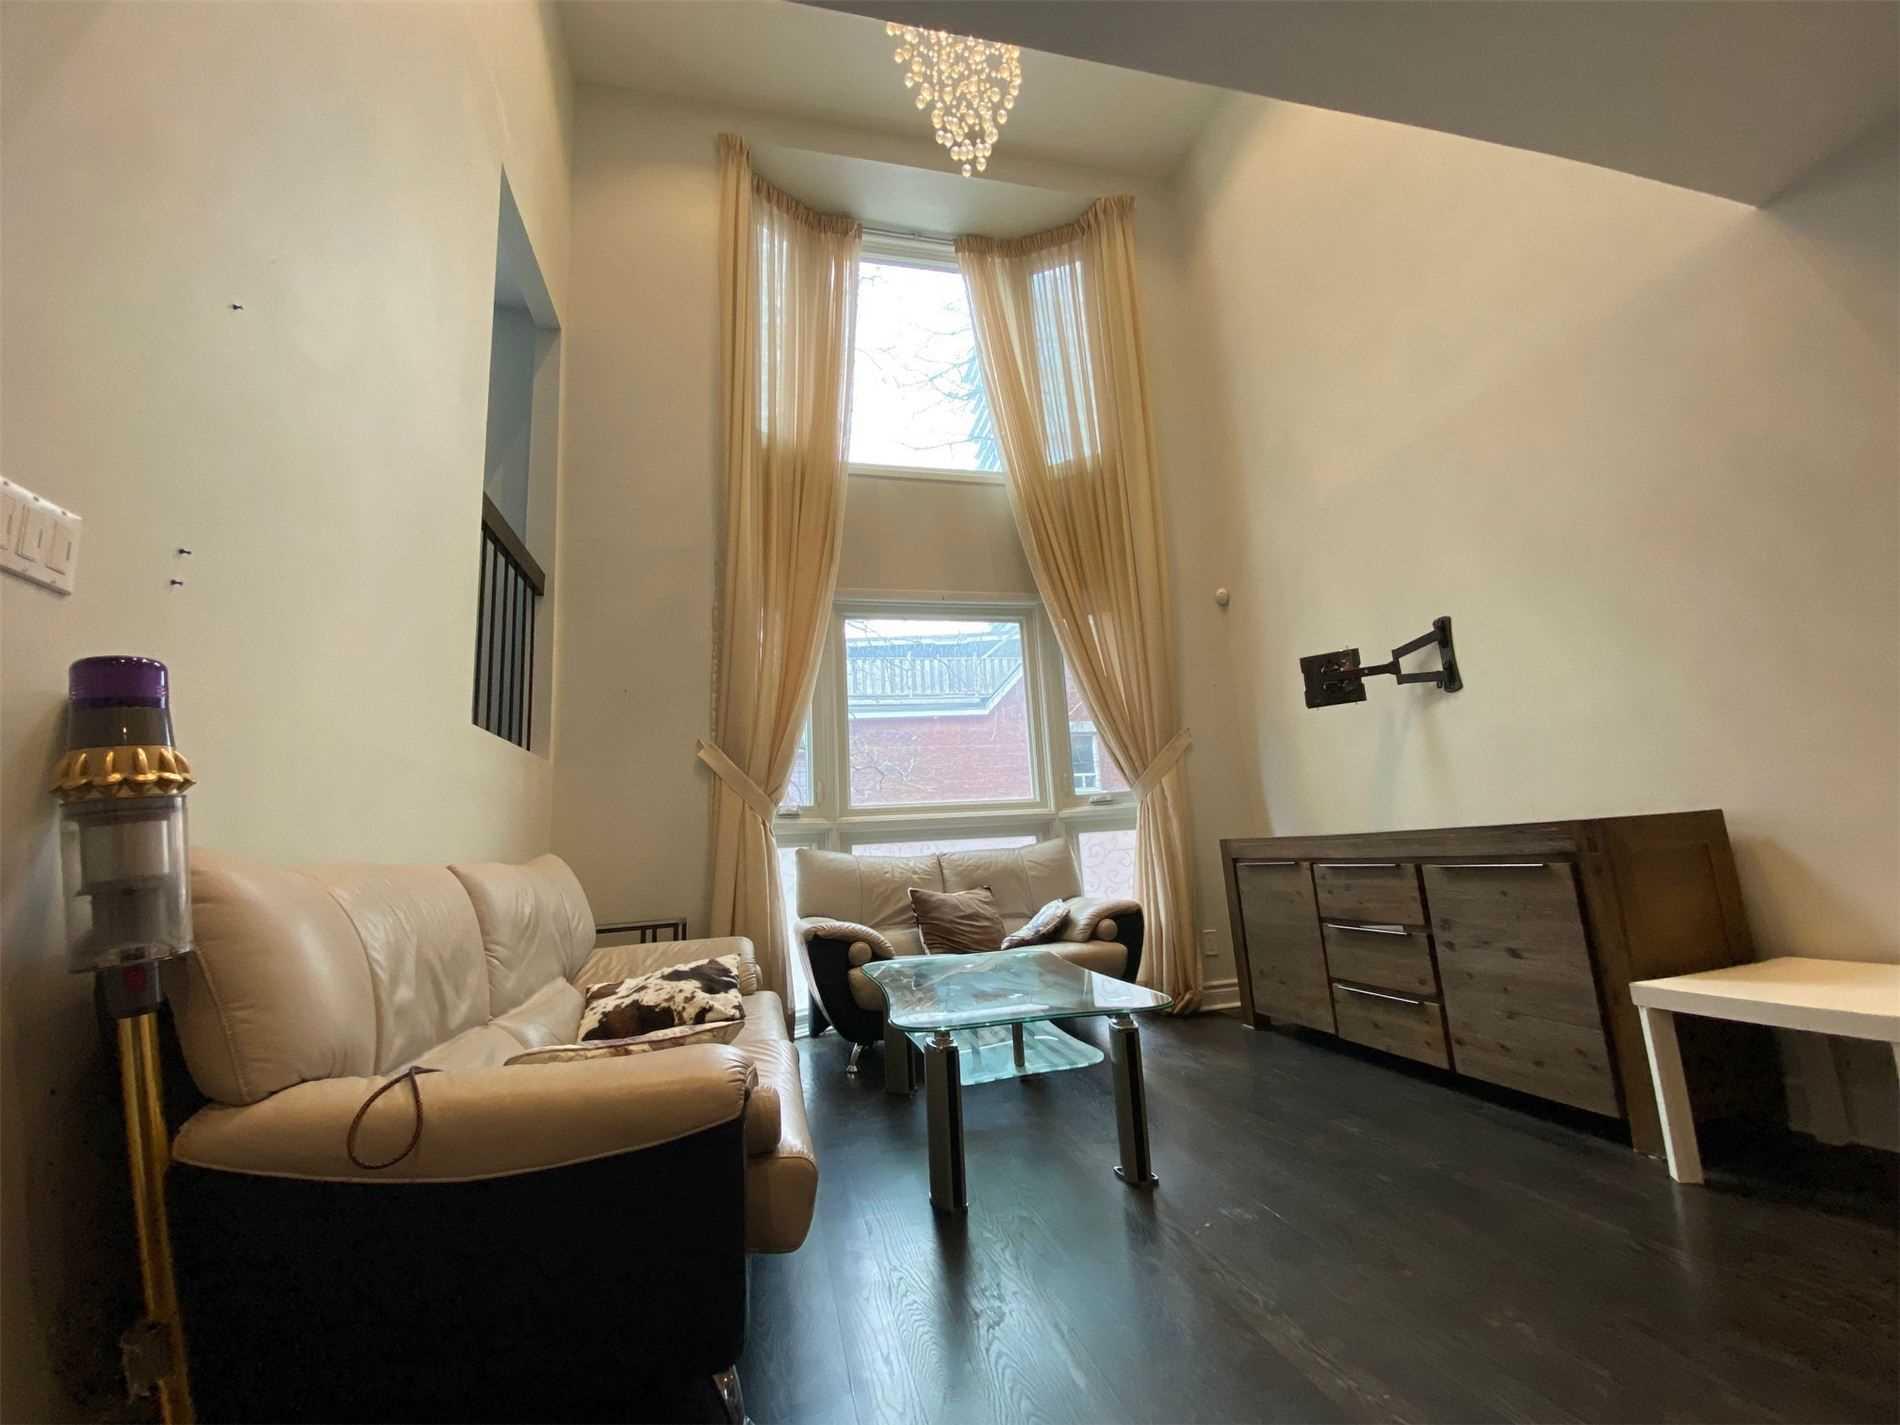 197 Mutual St, Toronto, Ontario M5B2B4, 5 Bedrooms Bedrooms, 7 Rooms Rooms,4 BathroomsBathrooms,Att/Row/Twnhouse,For Sale,Mutual,C5200158